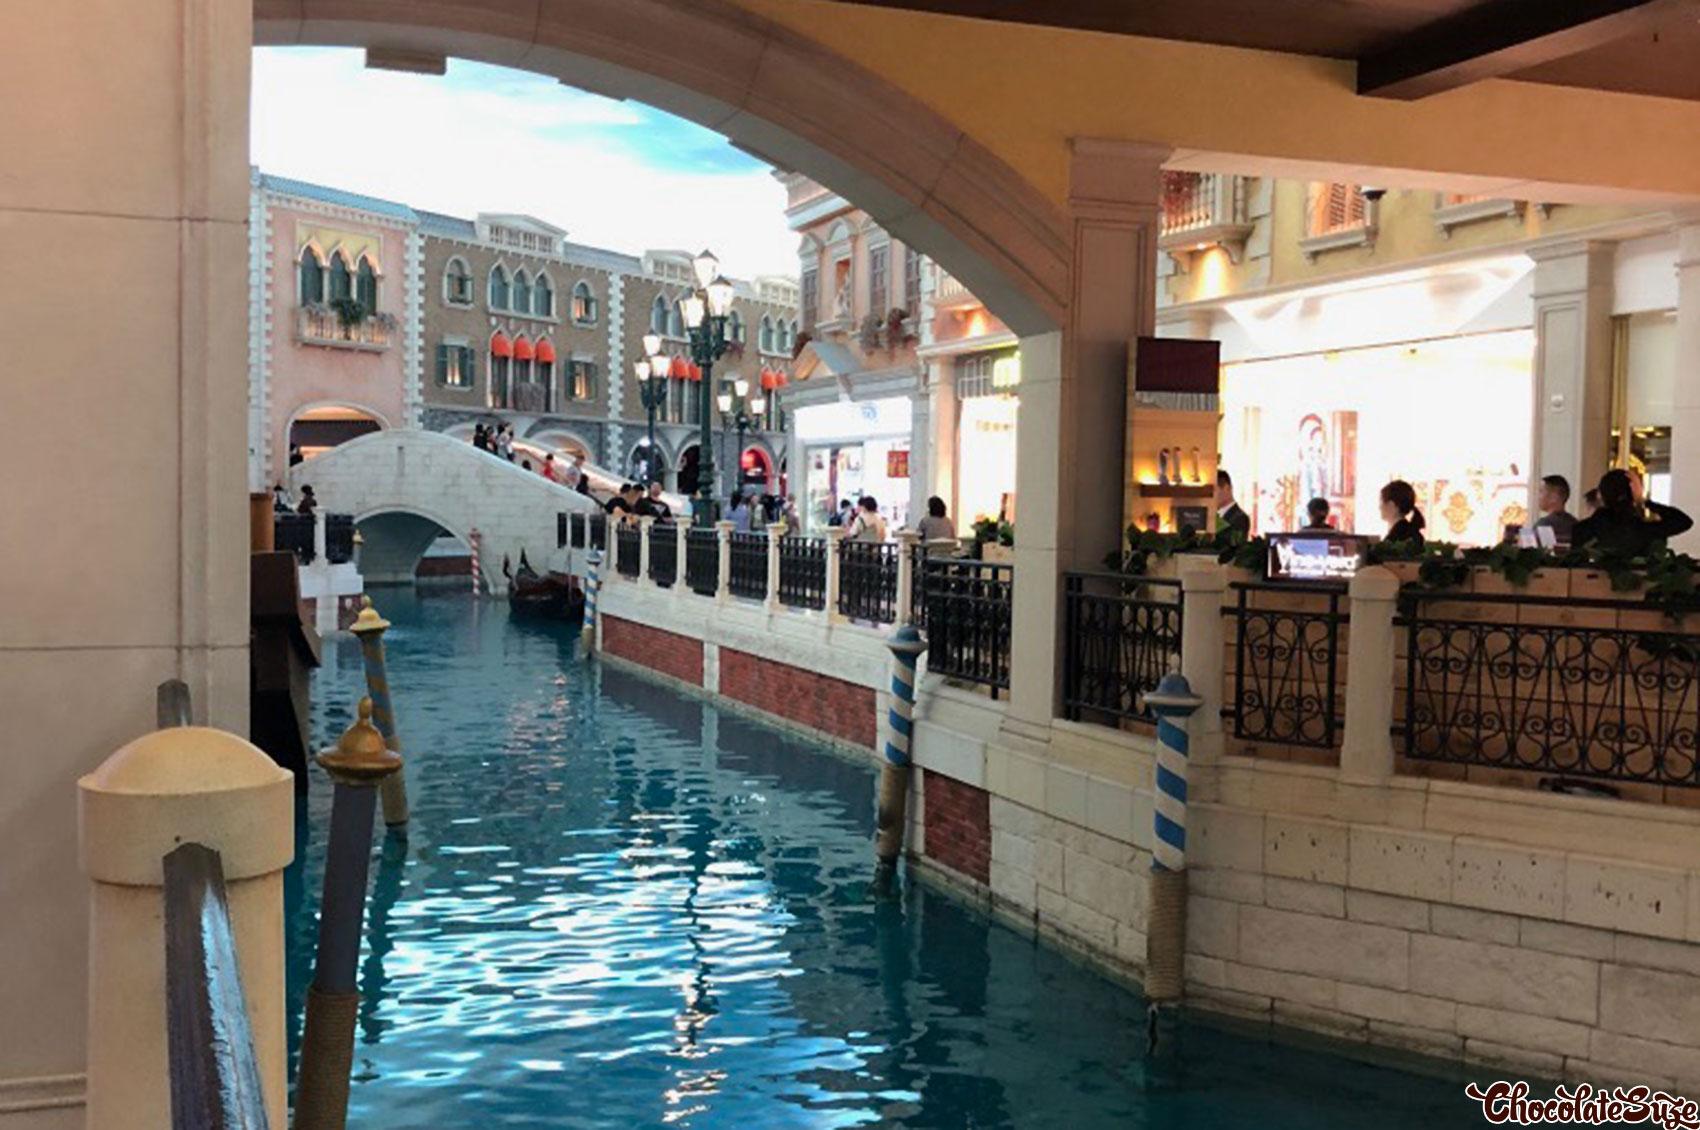 The Venetian, Macao